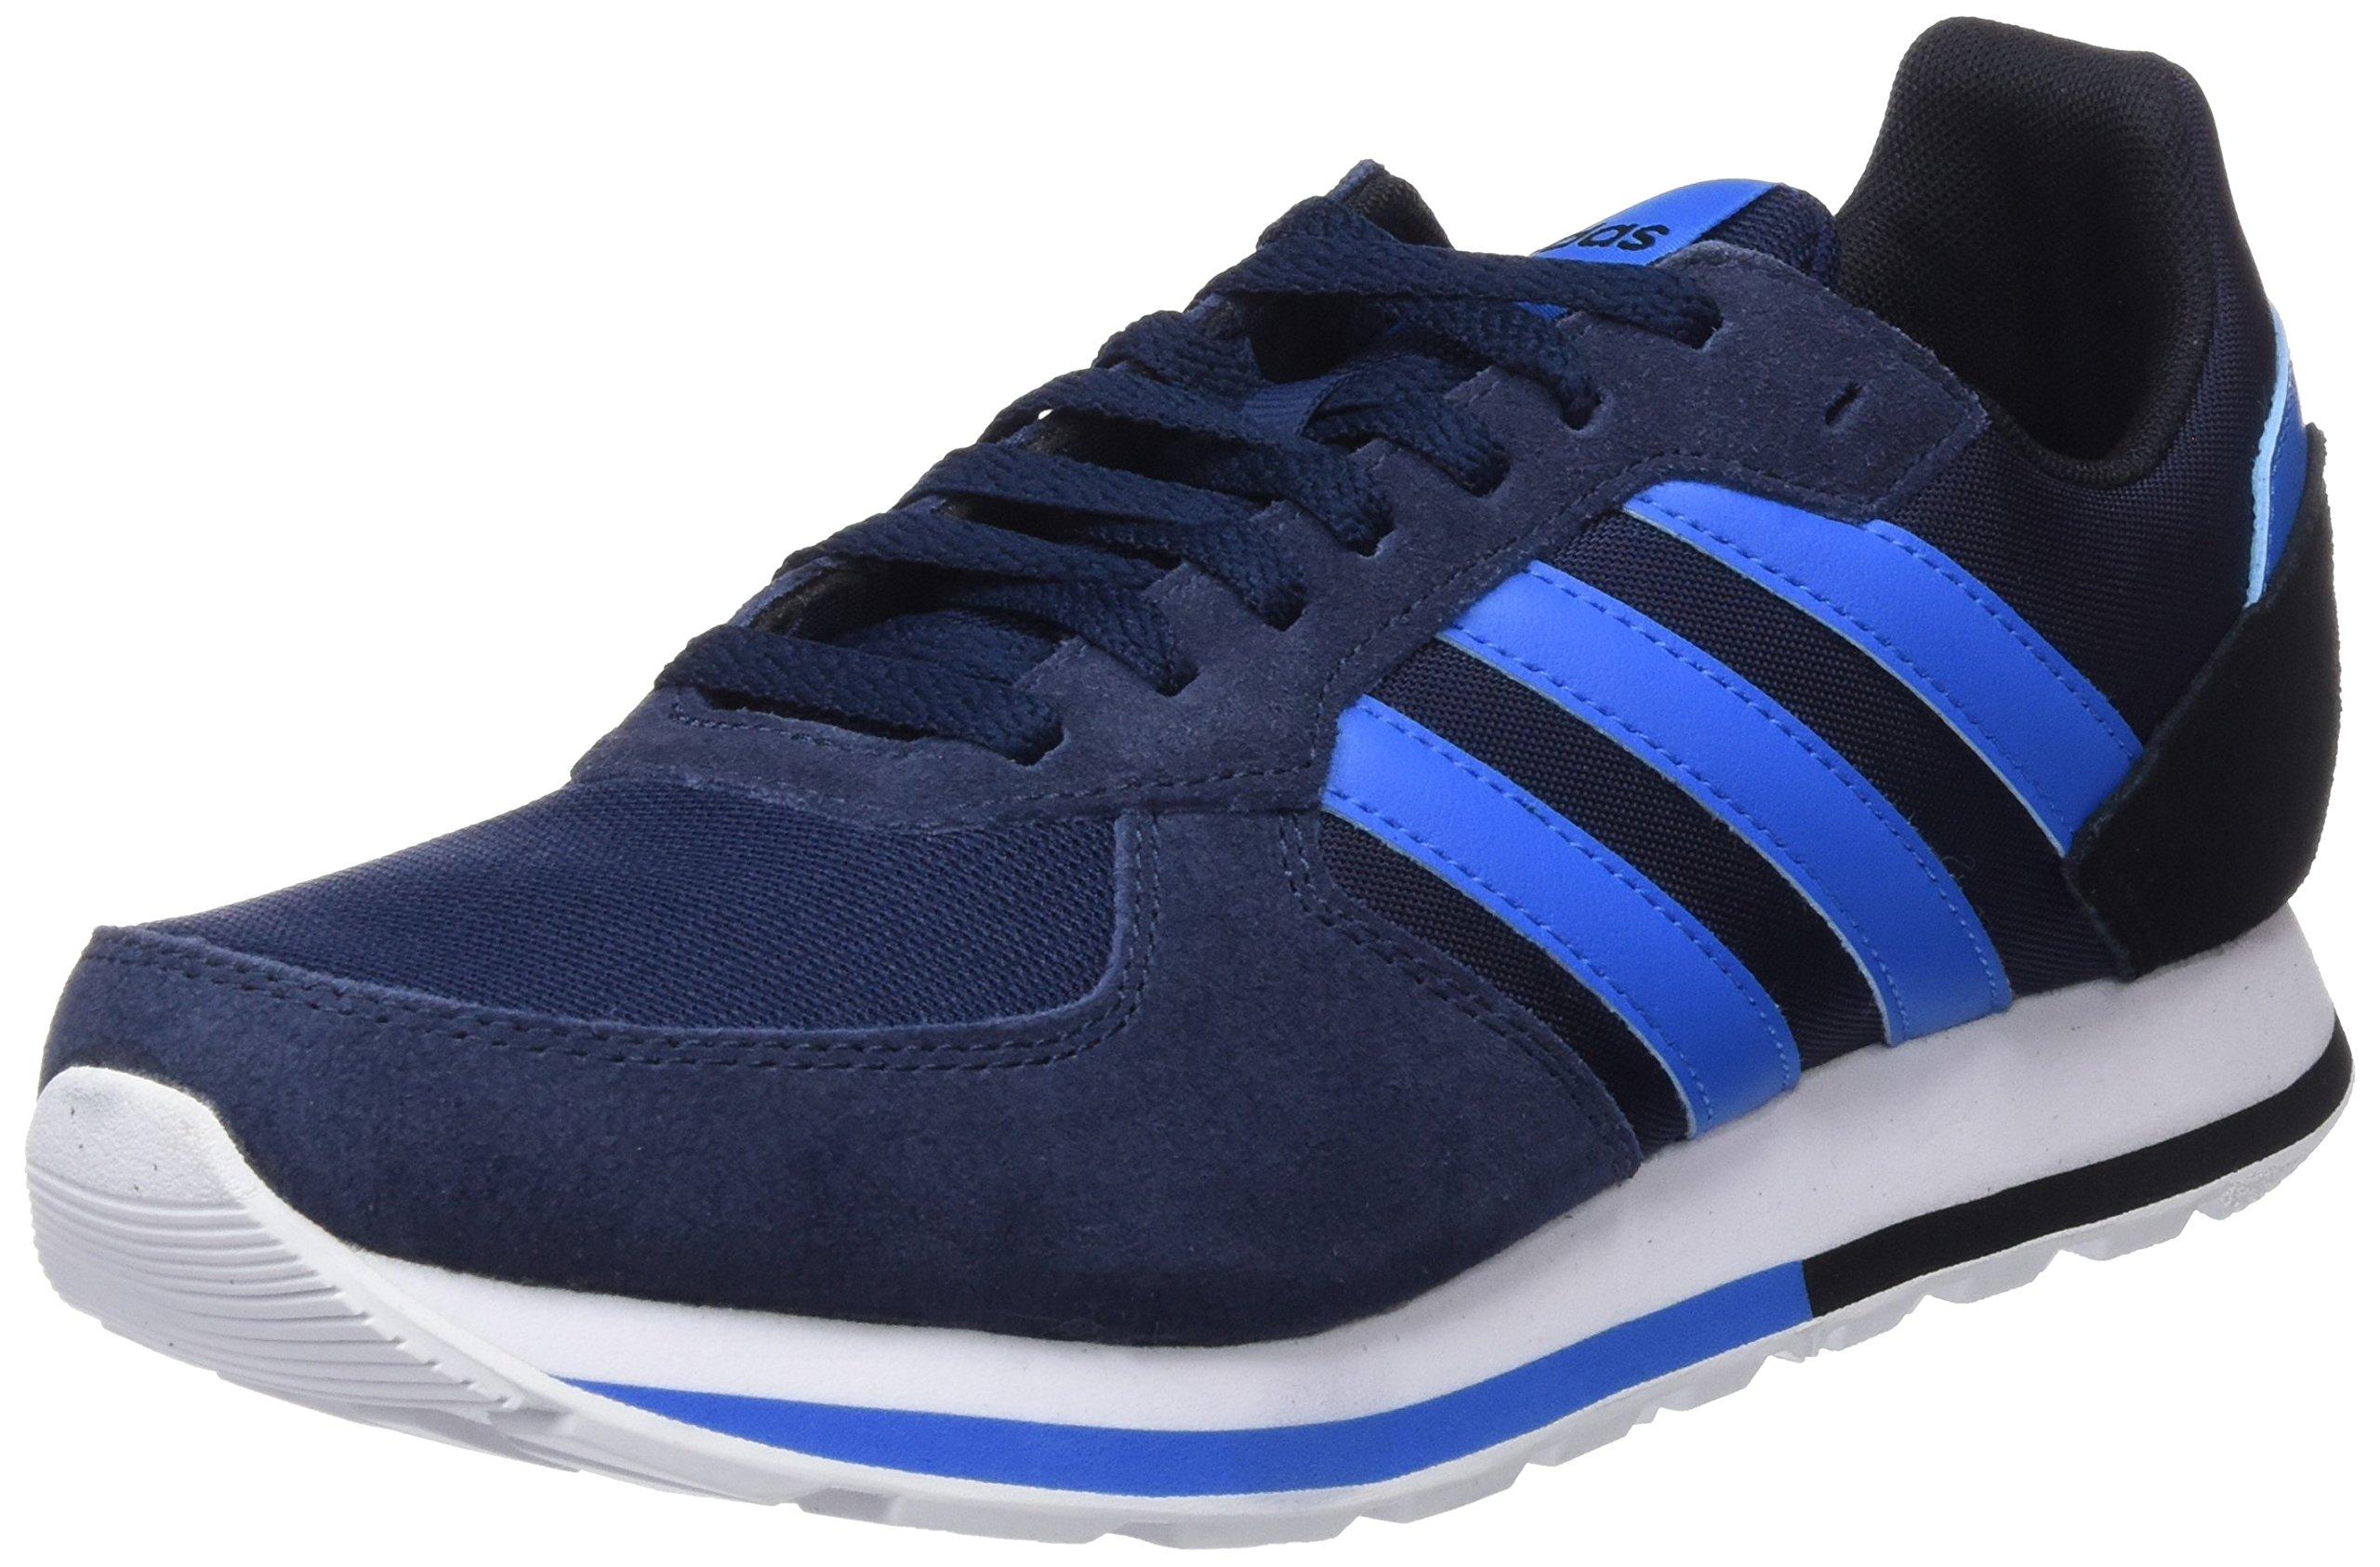 3 HommeBleunavy 8kSneakers Db172745 Adidas Eu Basses 1 FTK13Jcl